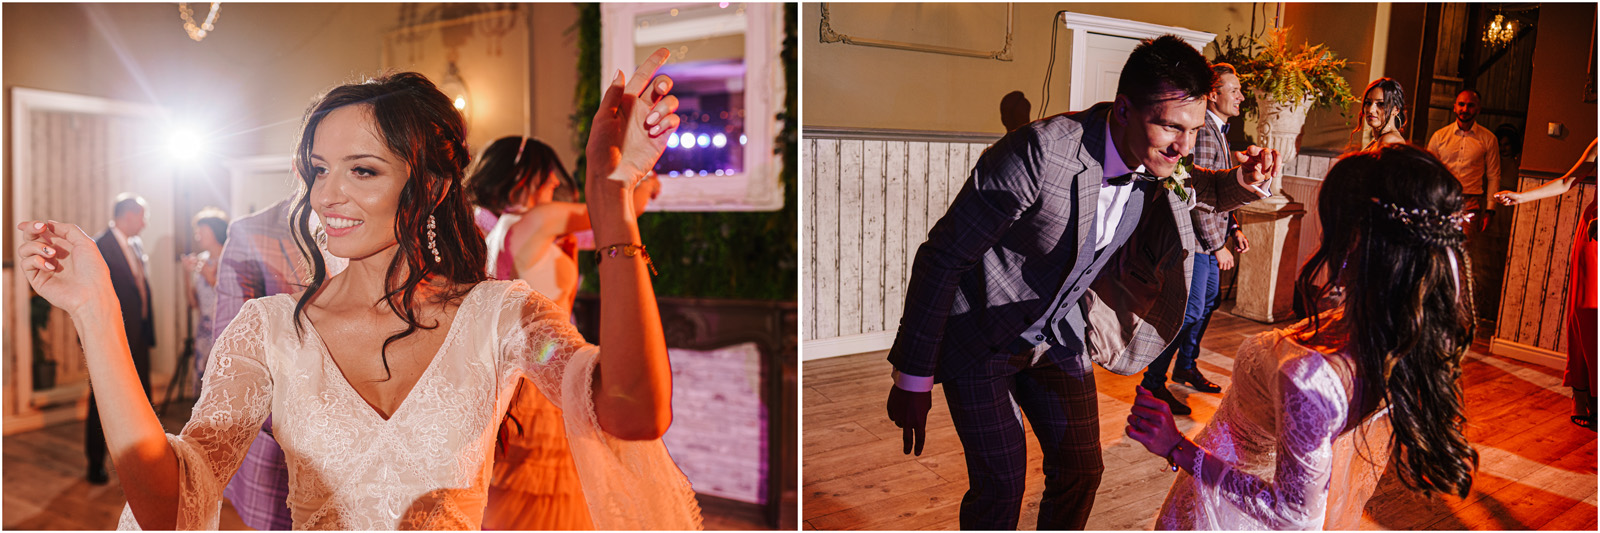 Ania & Mateusz | boho wesele w Stodole pod Kasztanami 110